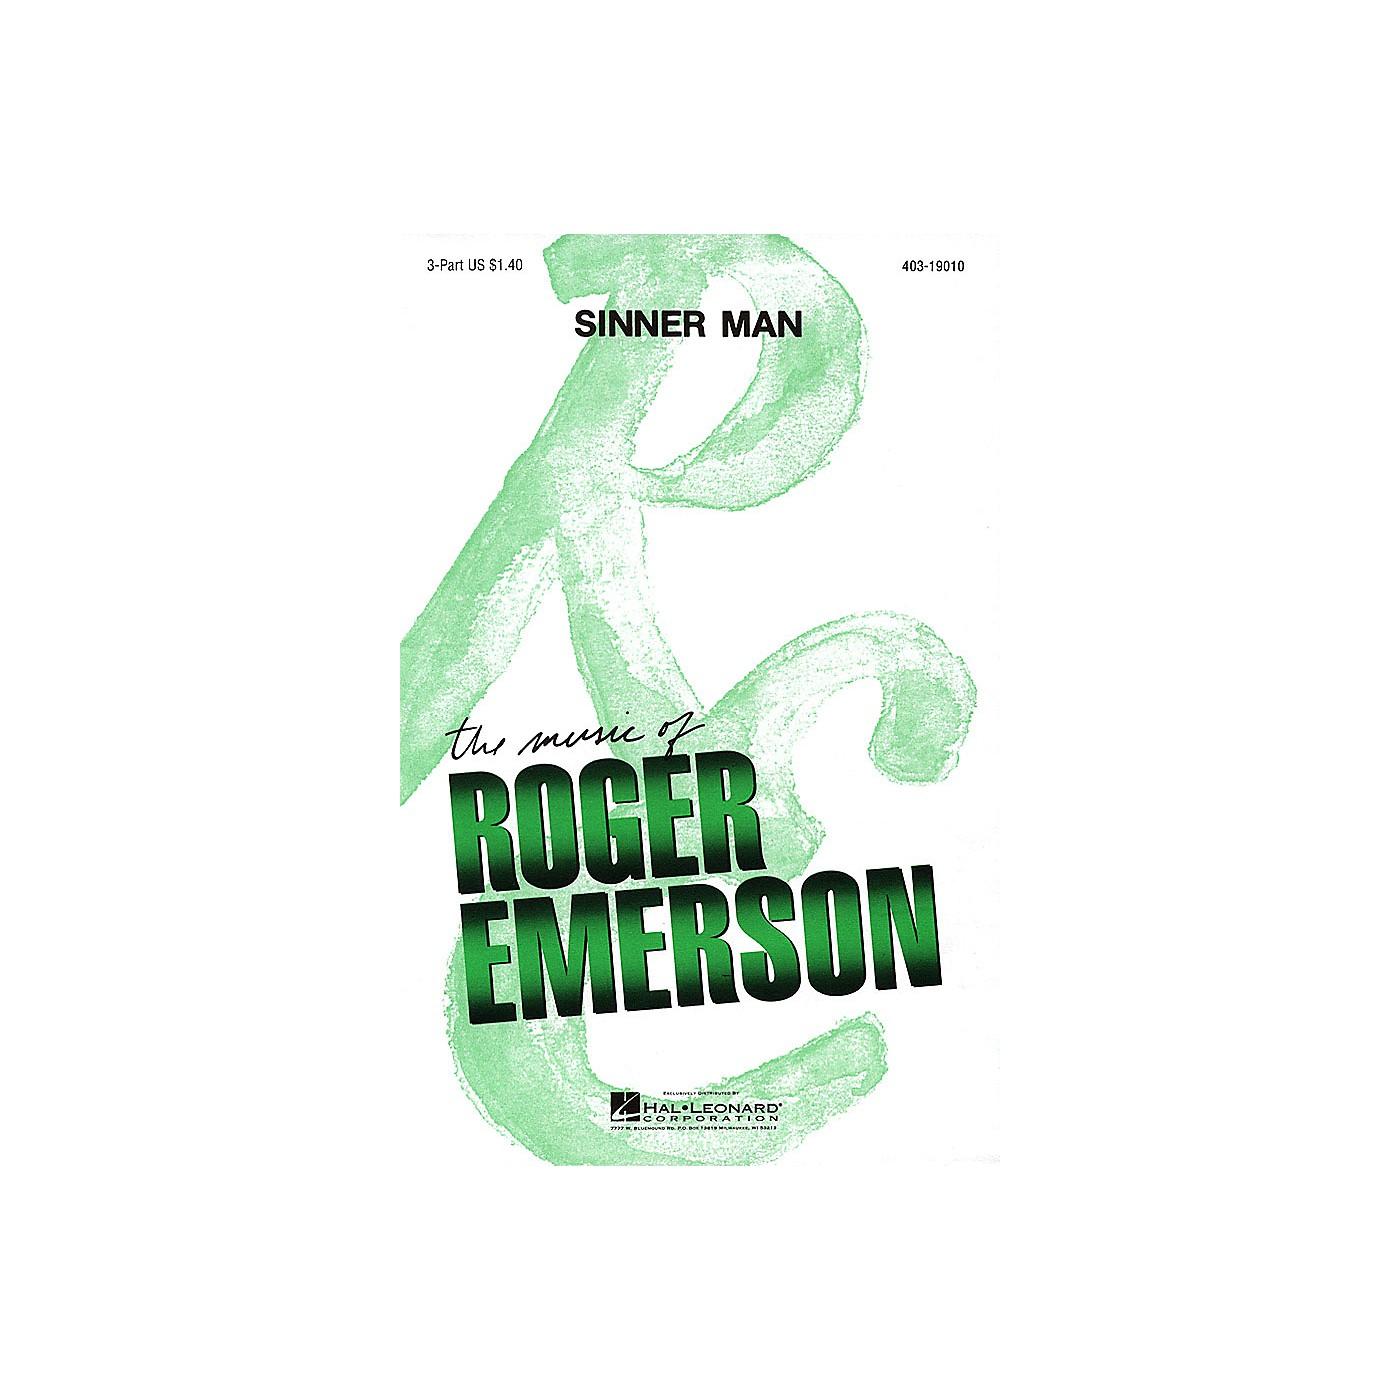 Hal Leonard Sinner Man 3 Part arranged by Roger Emerson thumbnail